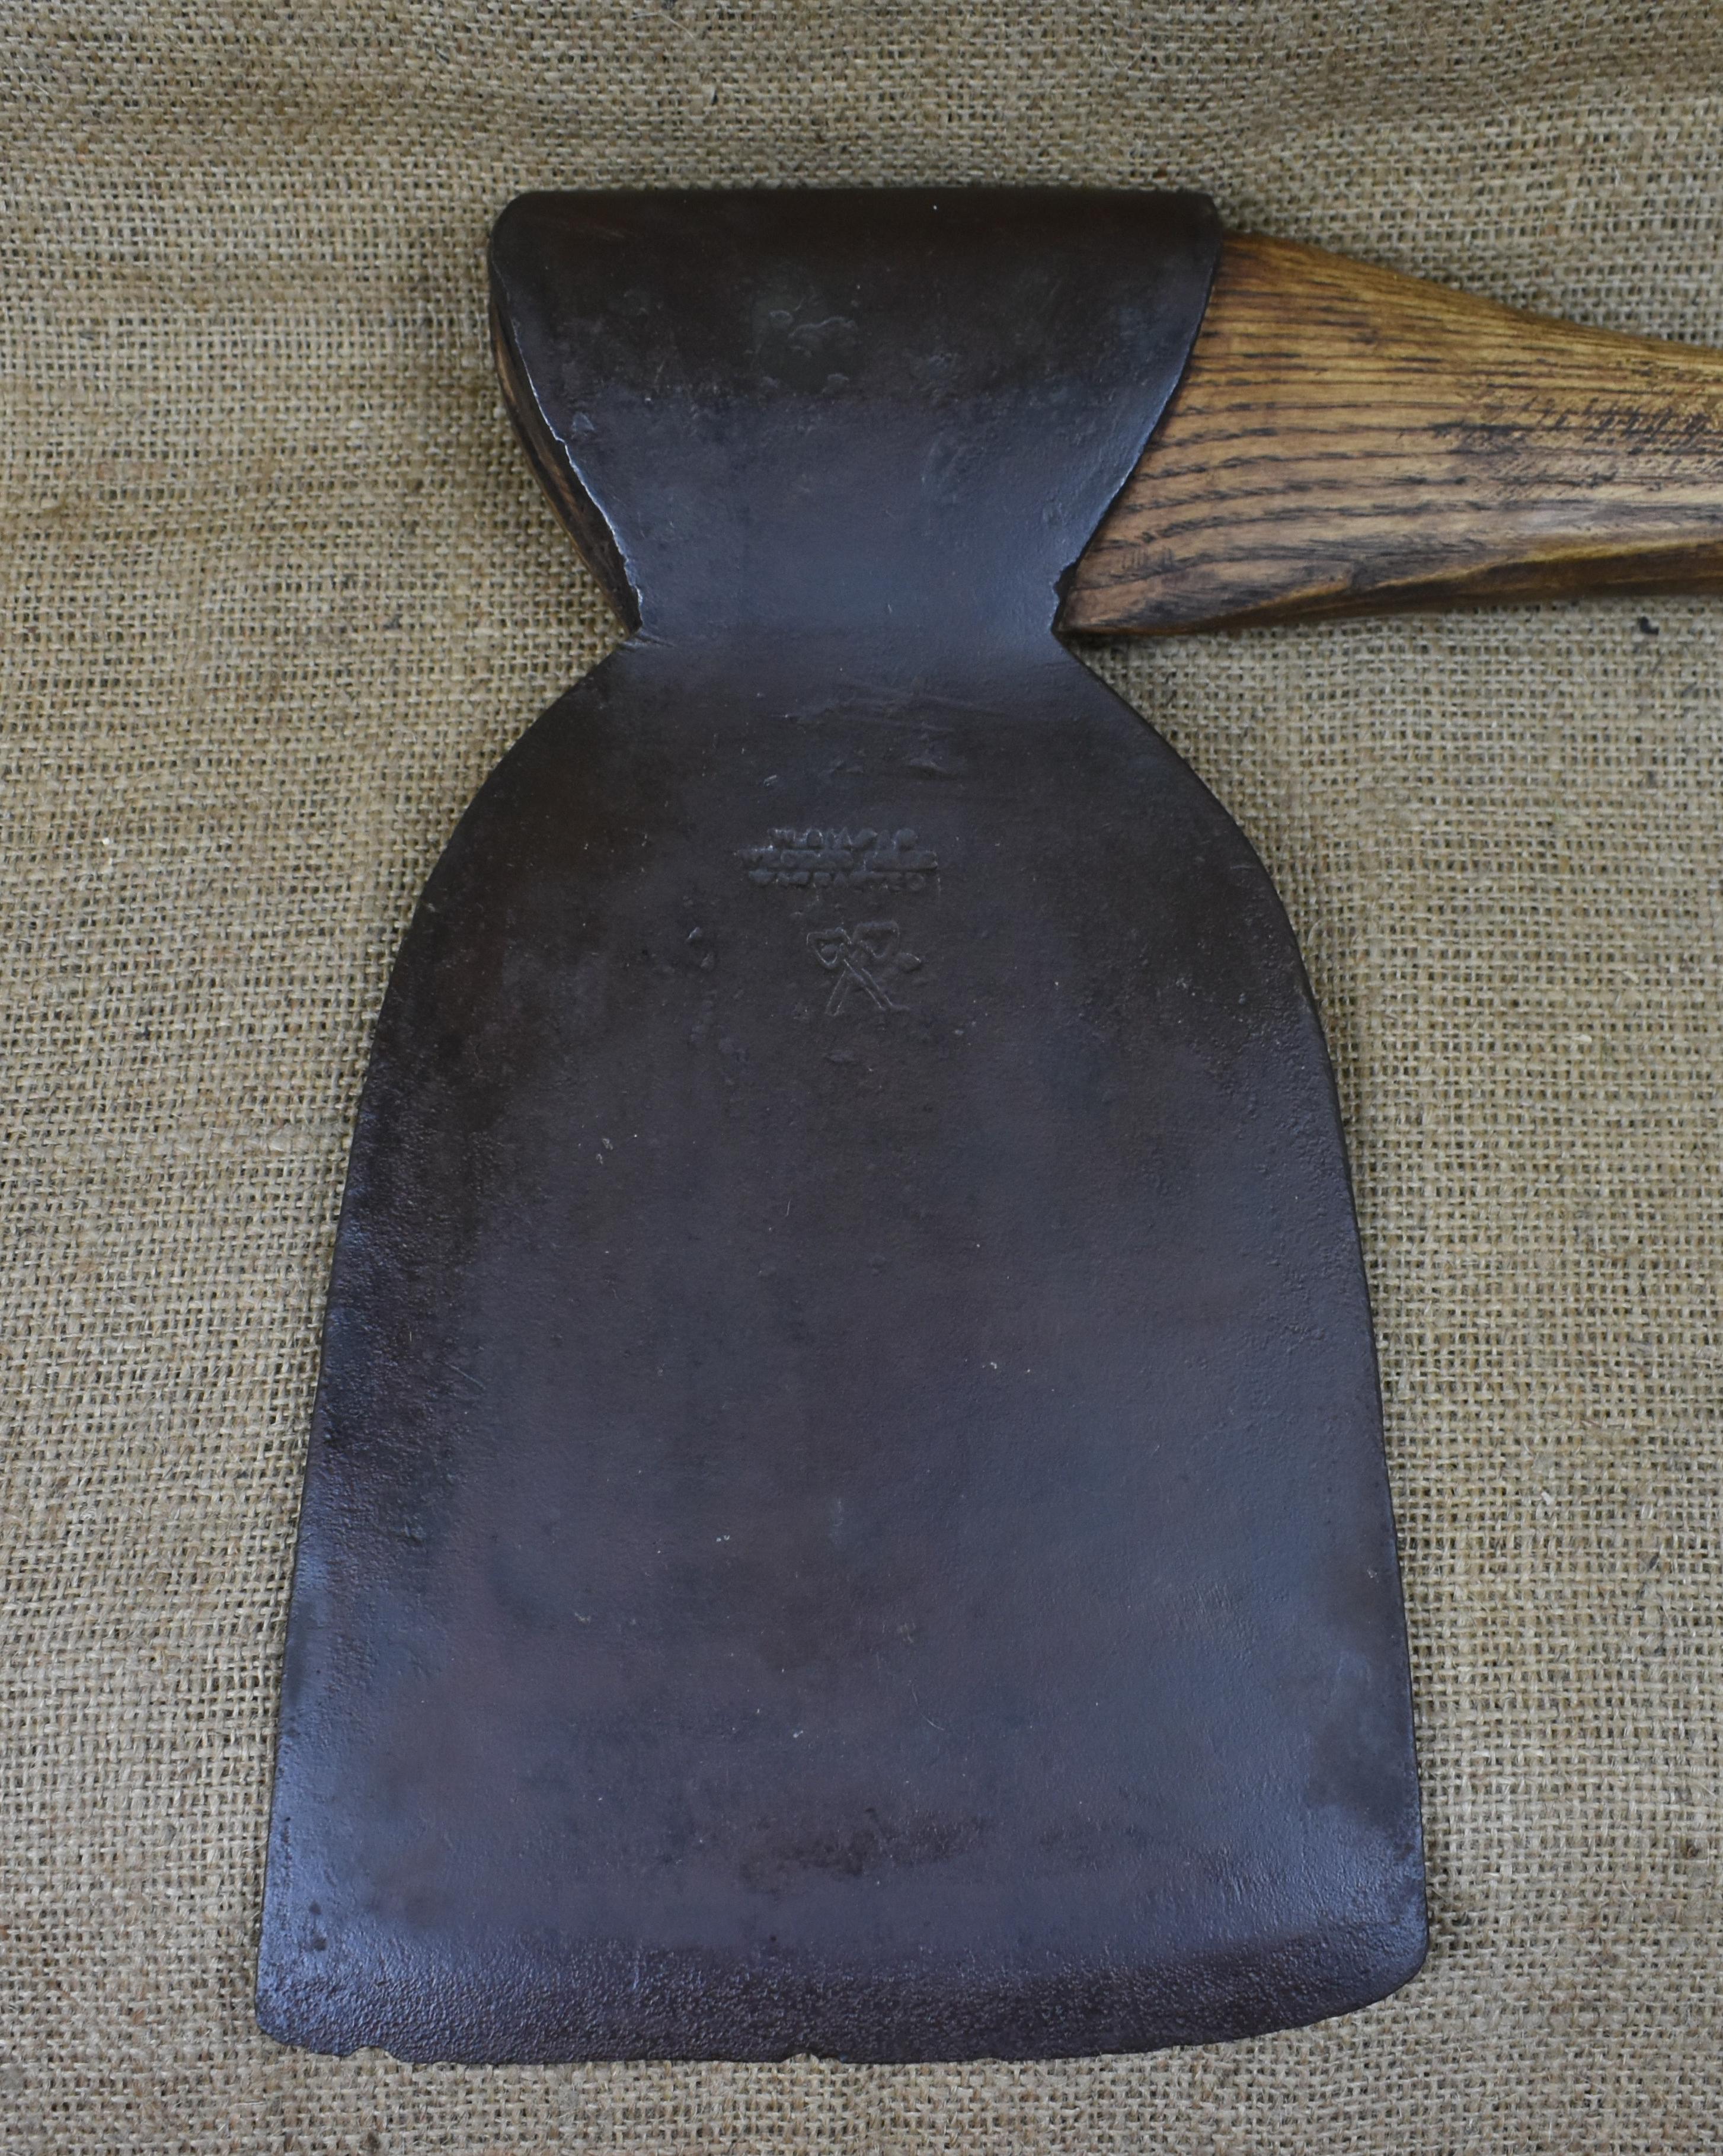 W.Gilpin 7lb Mast Maker's axe